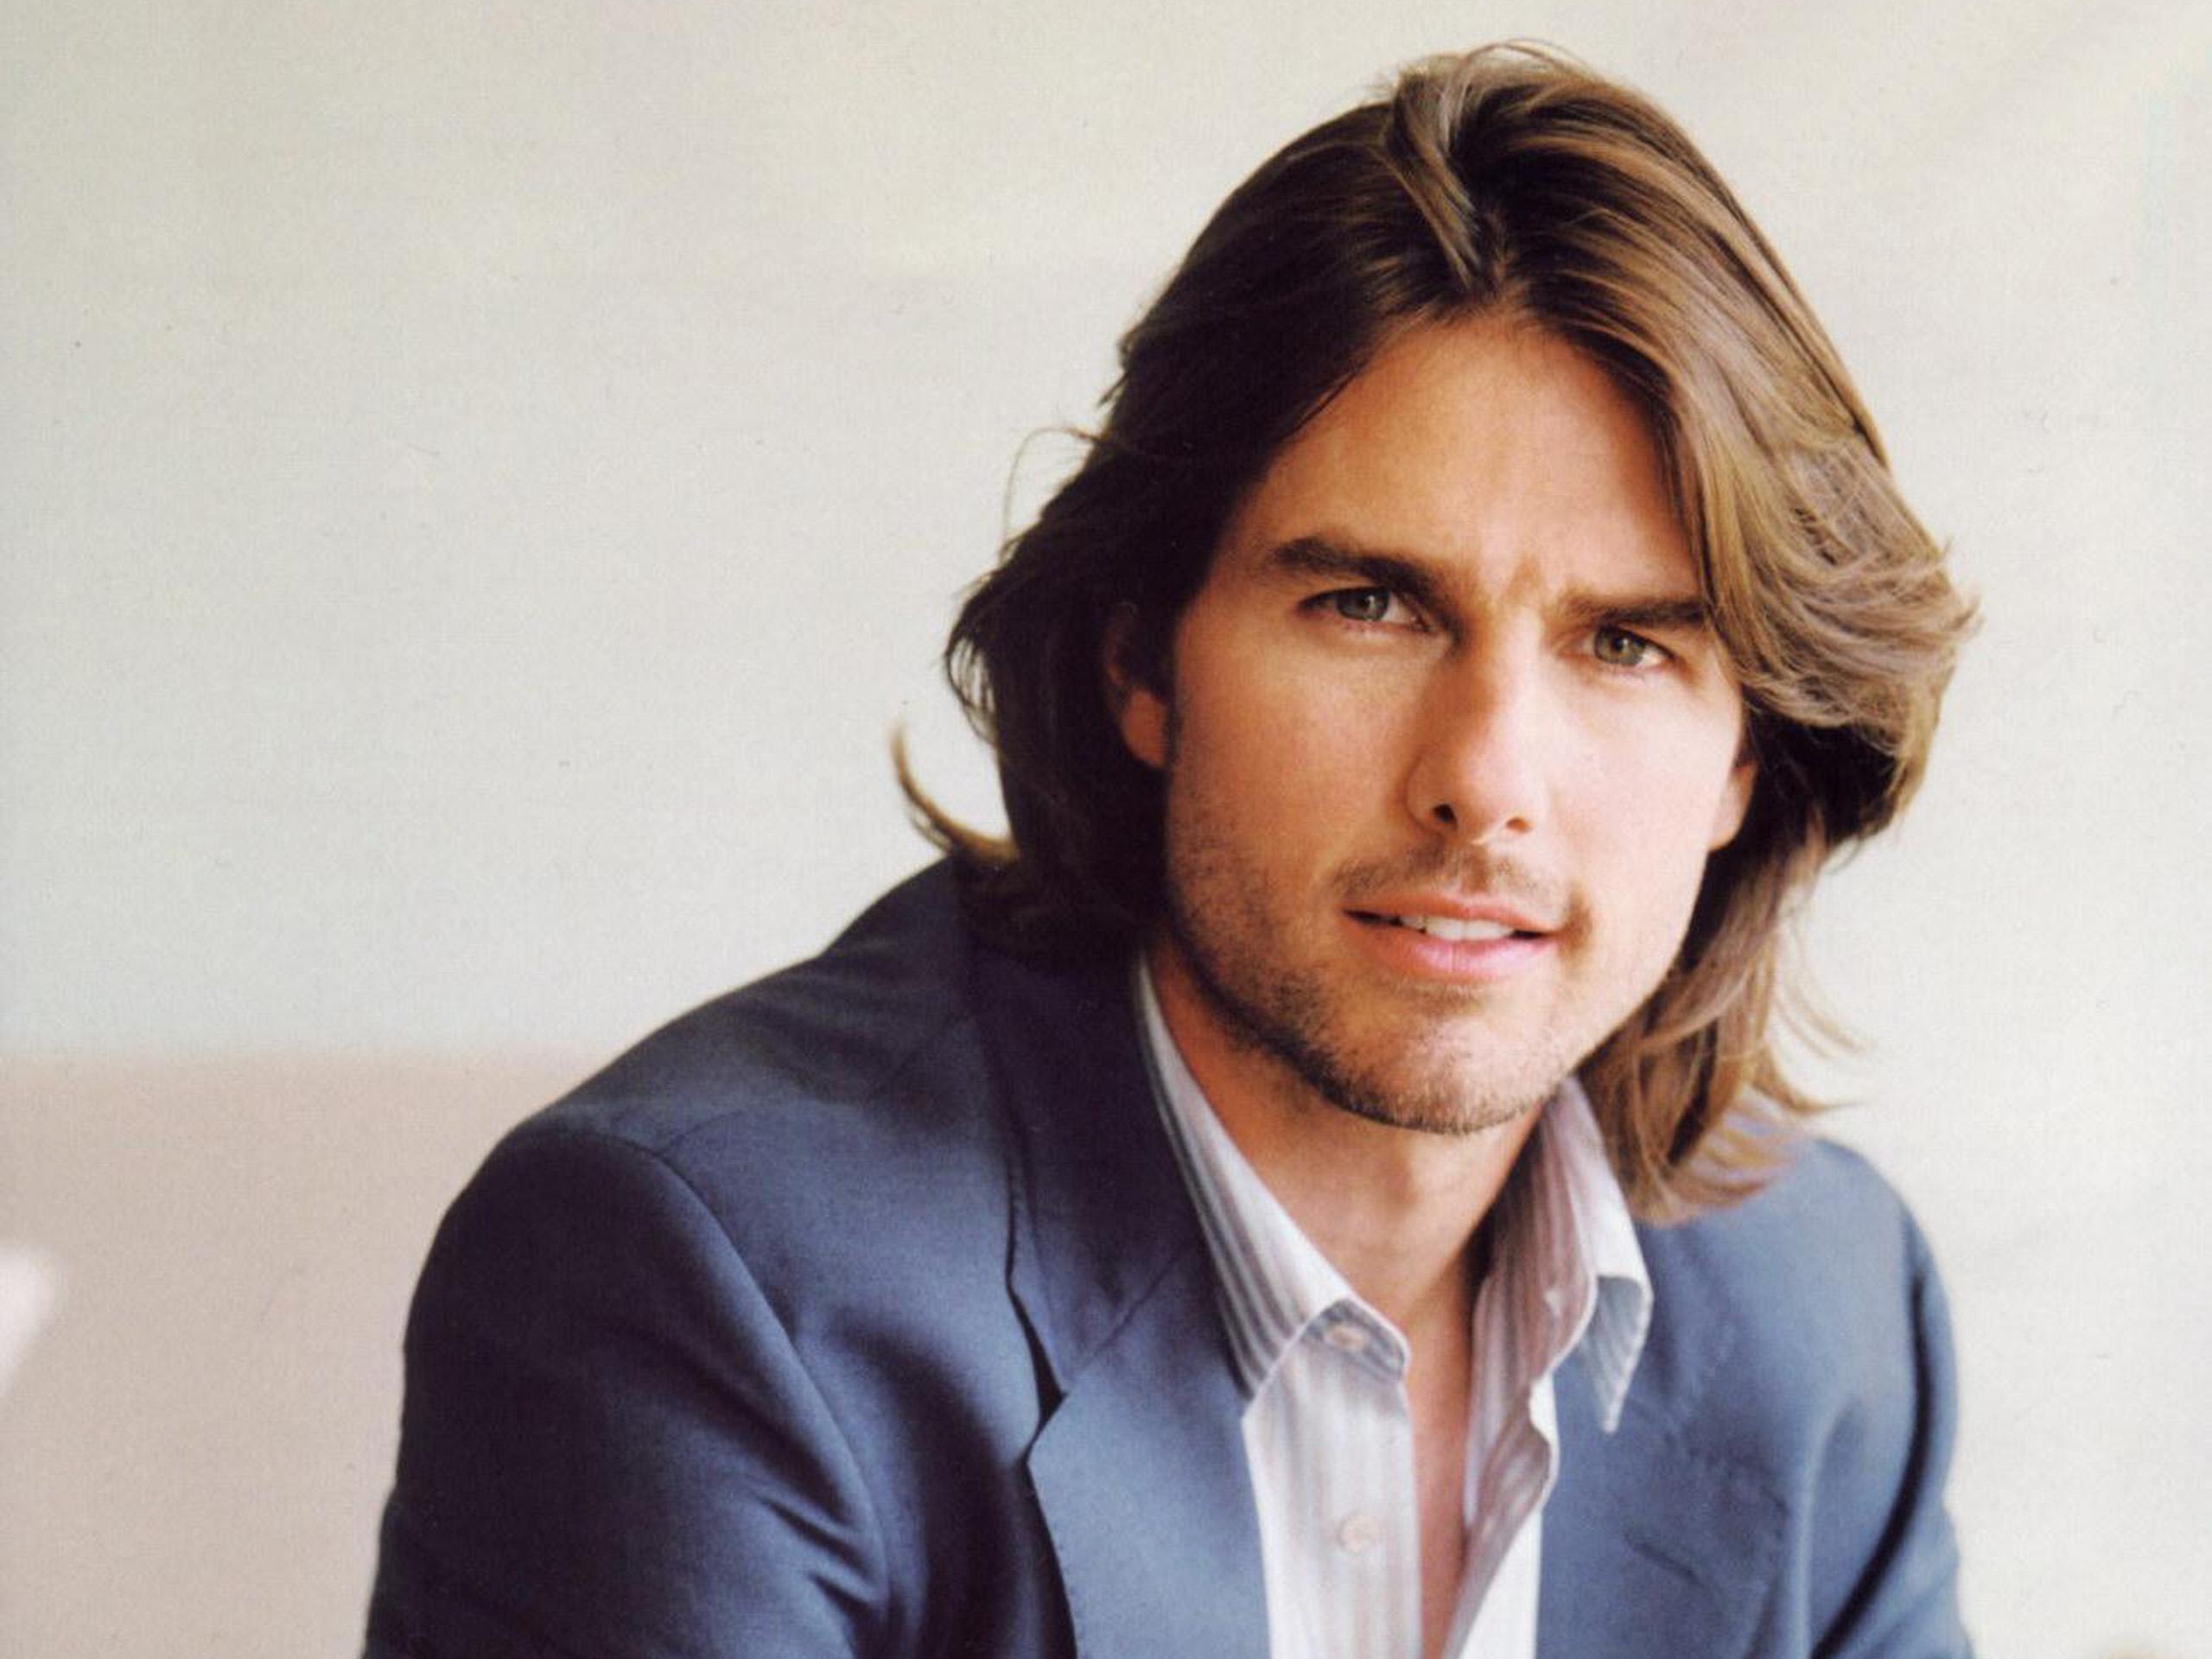 Tom Cruise Wallpaper 2560x1920